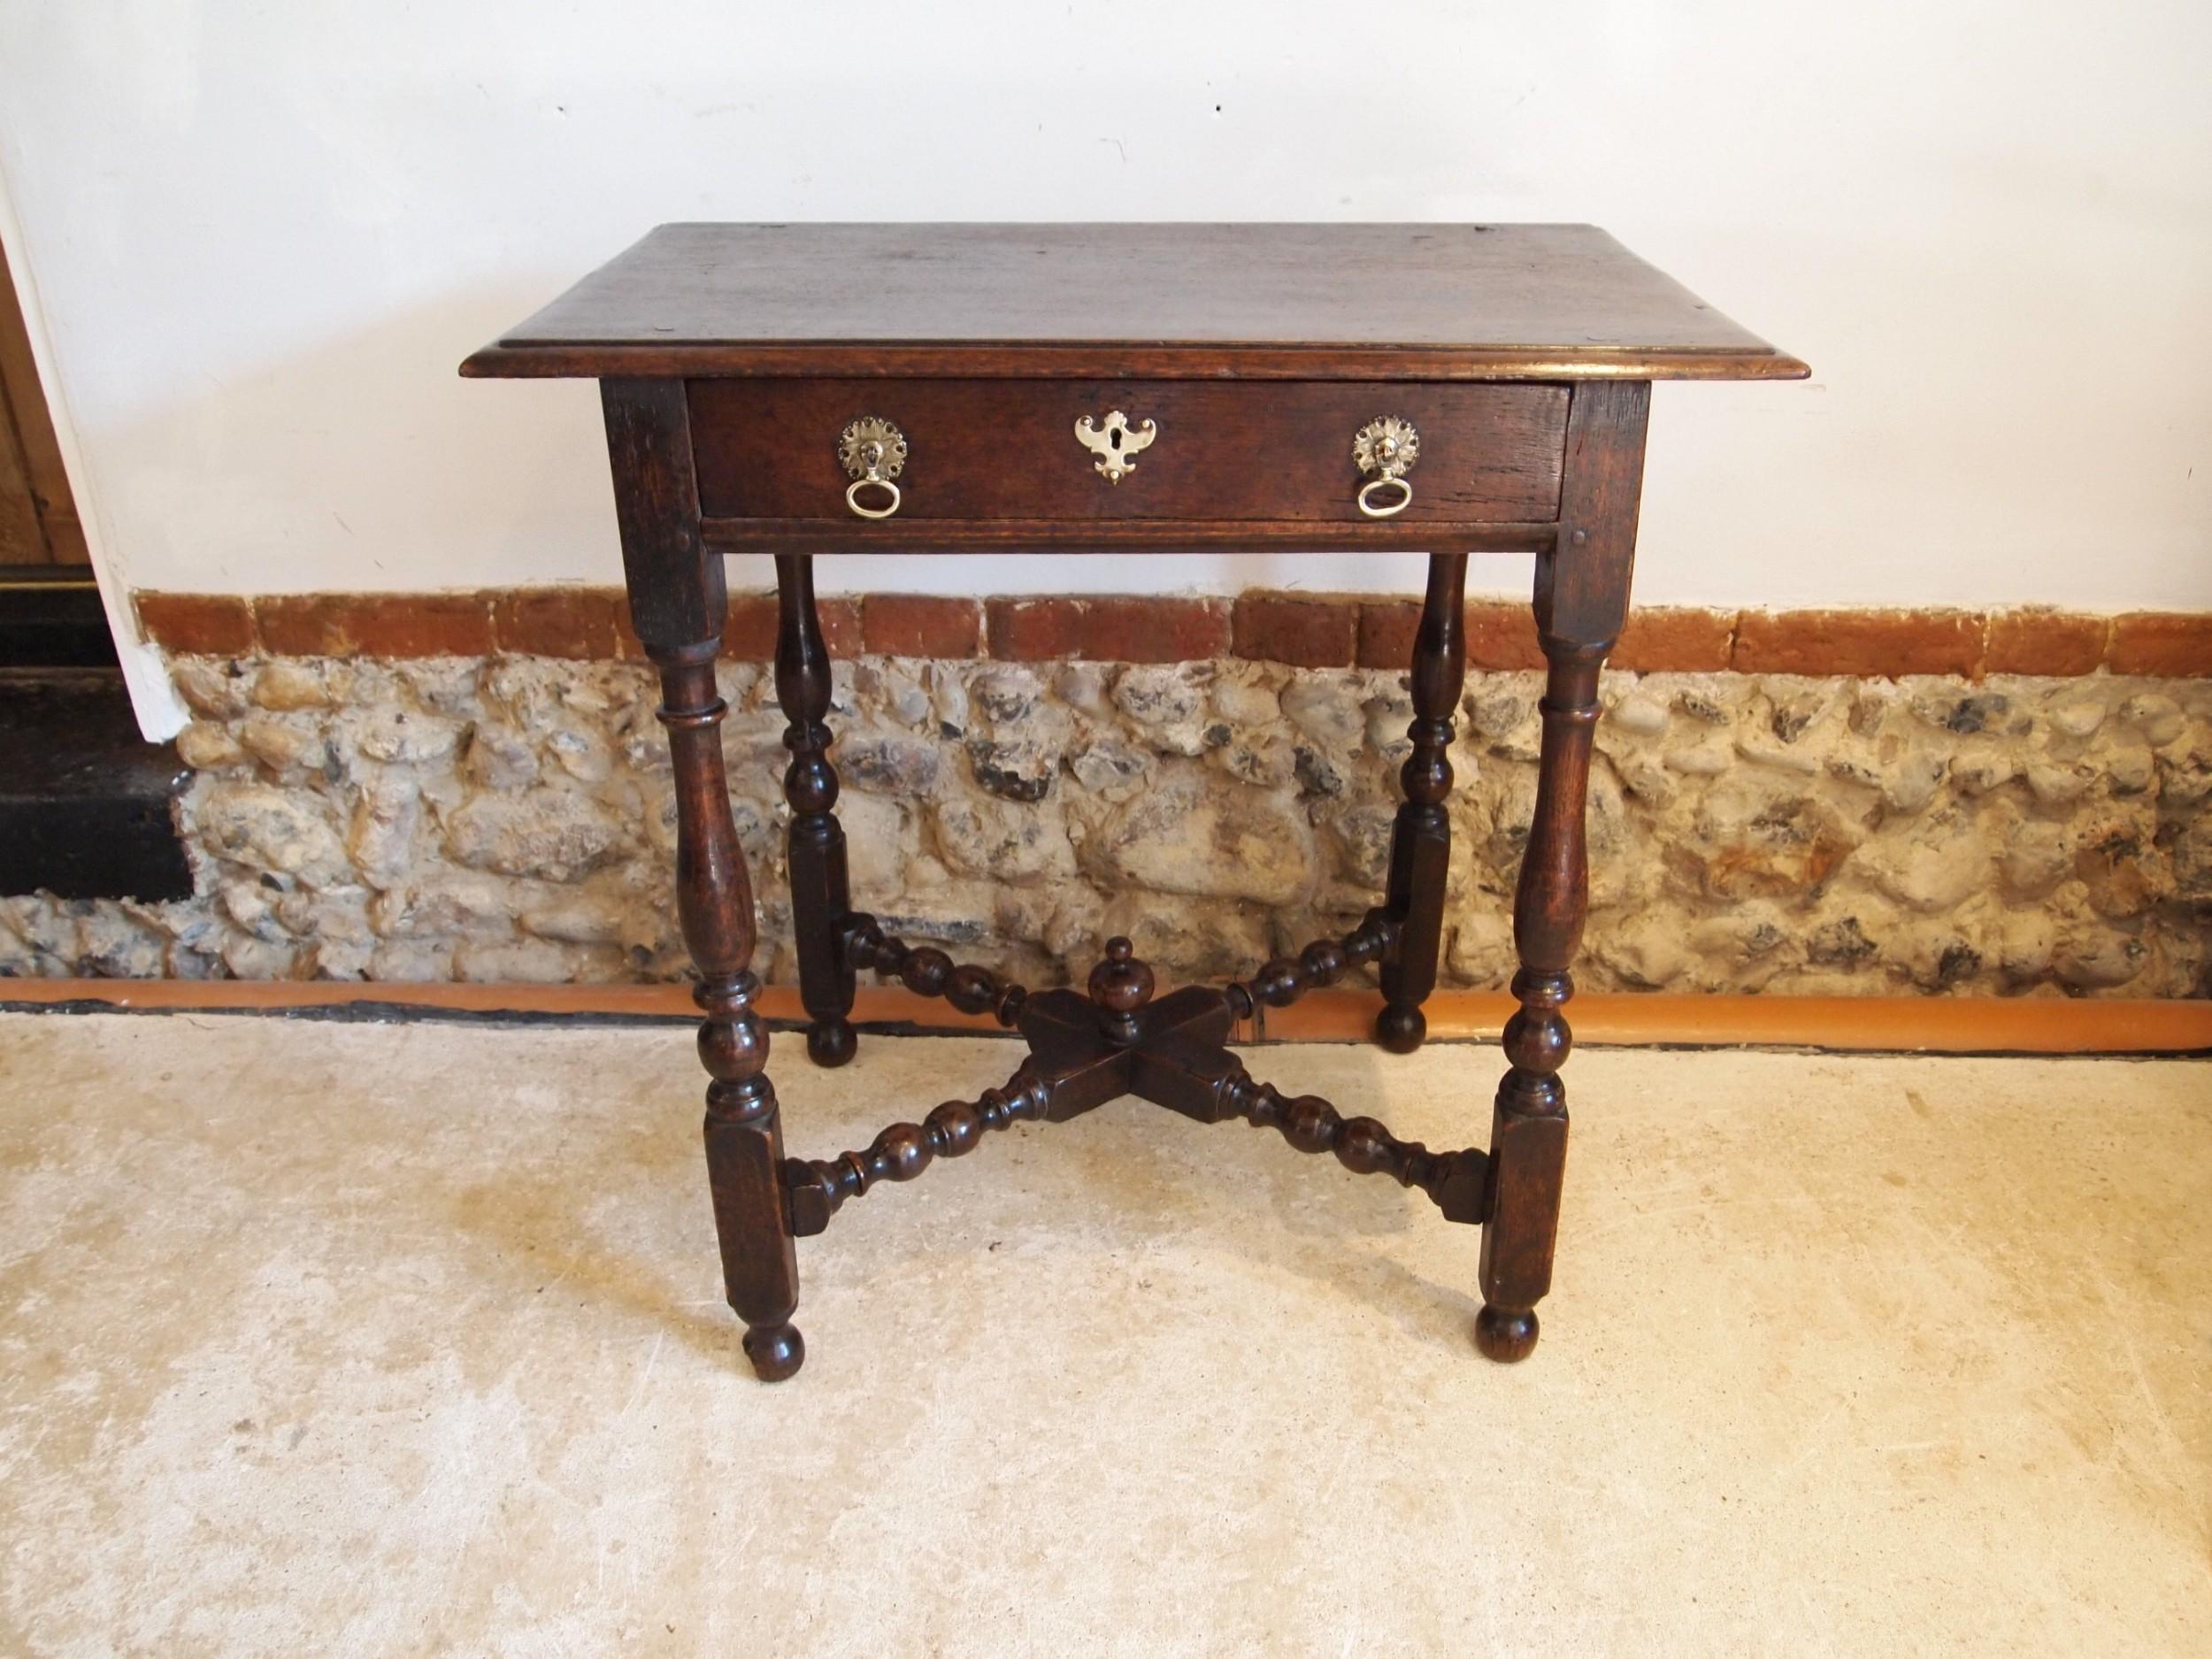 table rare queen anne oak side hall console lowboy c1700